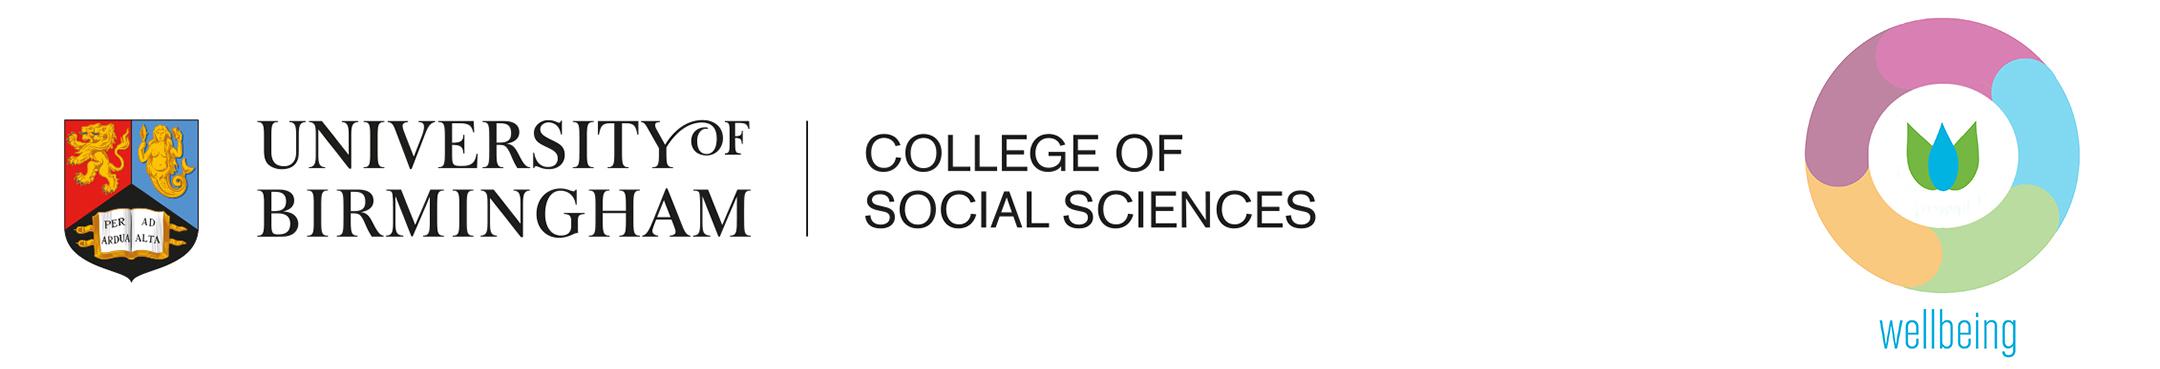 CoSS Wellbeing Taskforce Logo